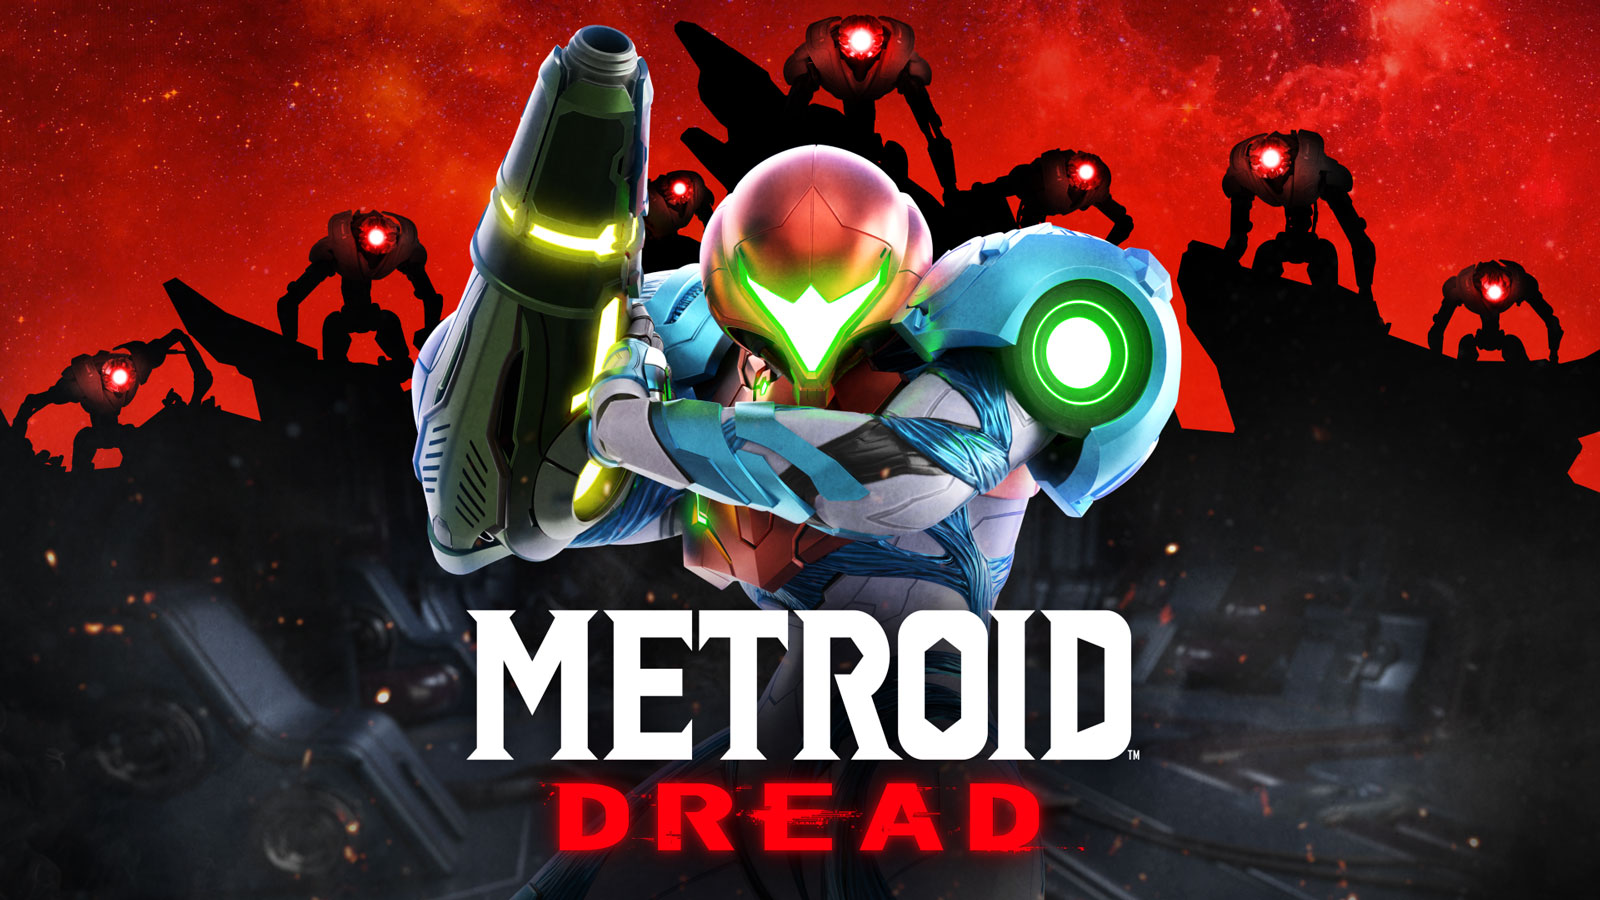 Free Metroid Dread Wallpaper in 1600x900